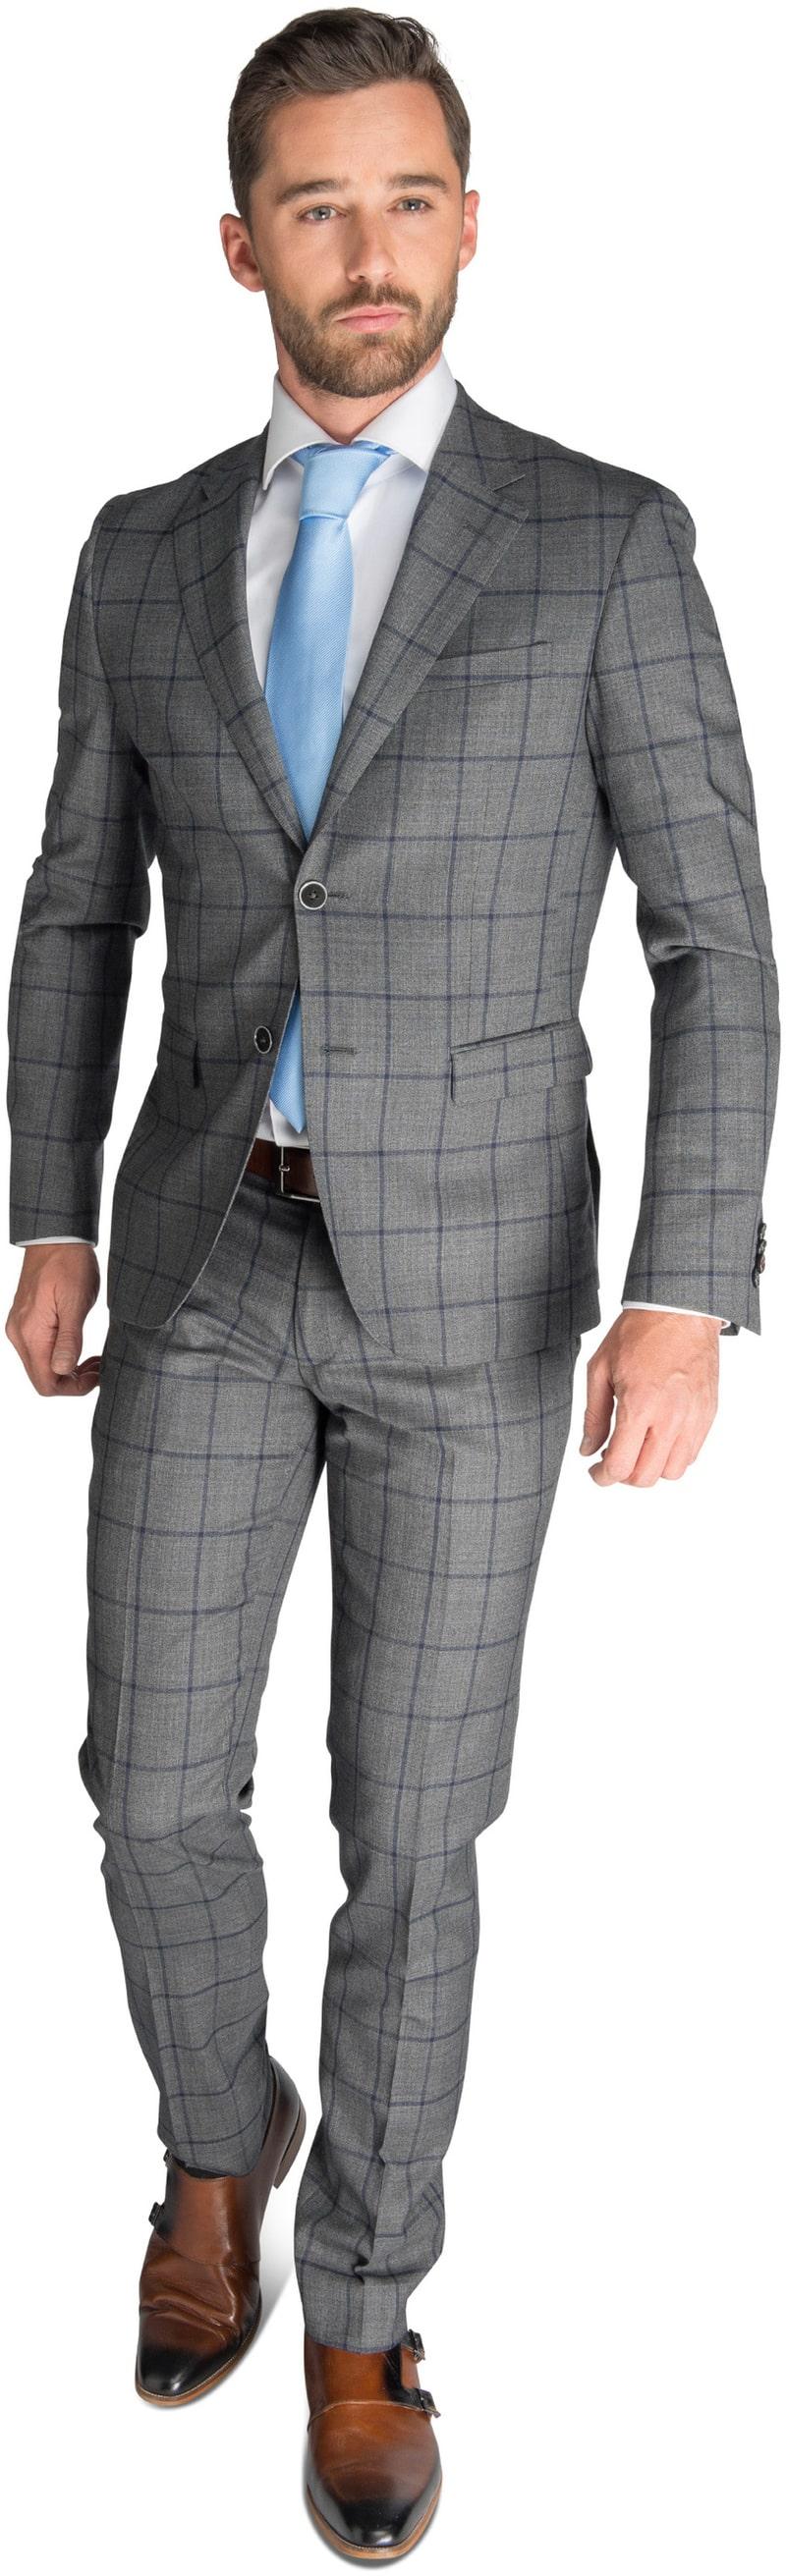 Detail Suitable Kostuum Bern Antraciet